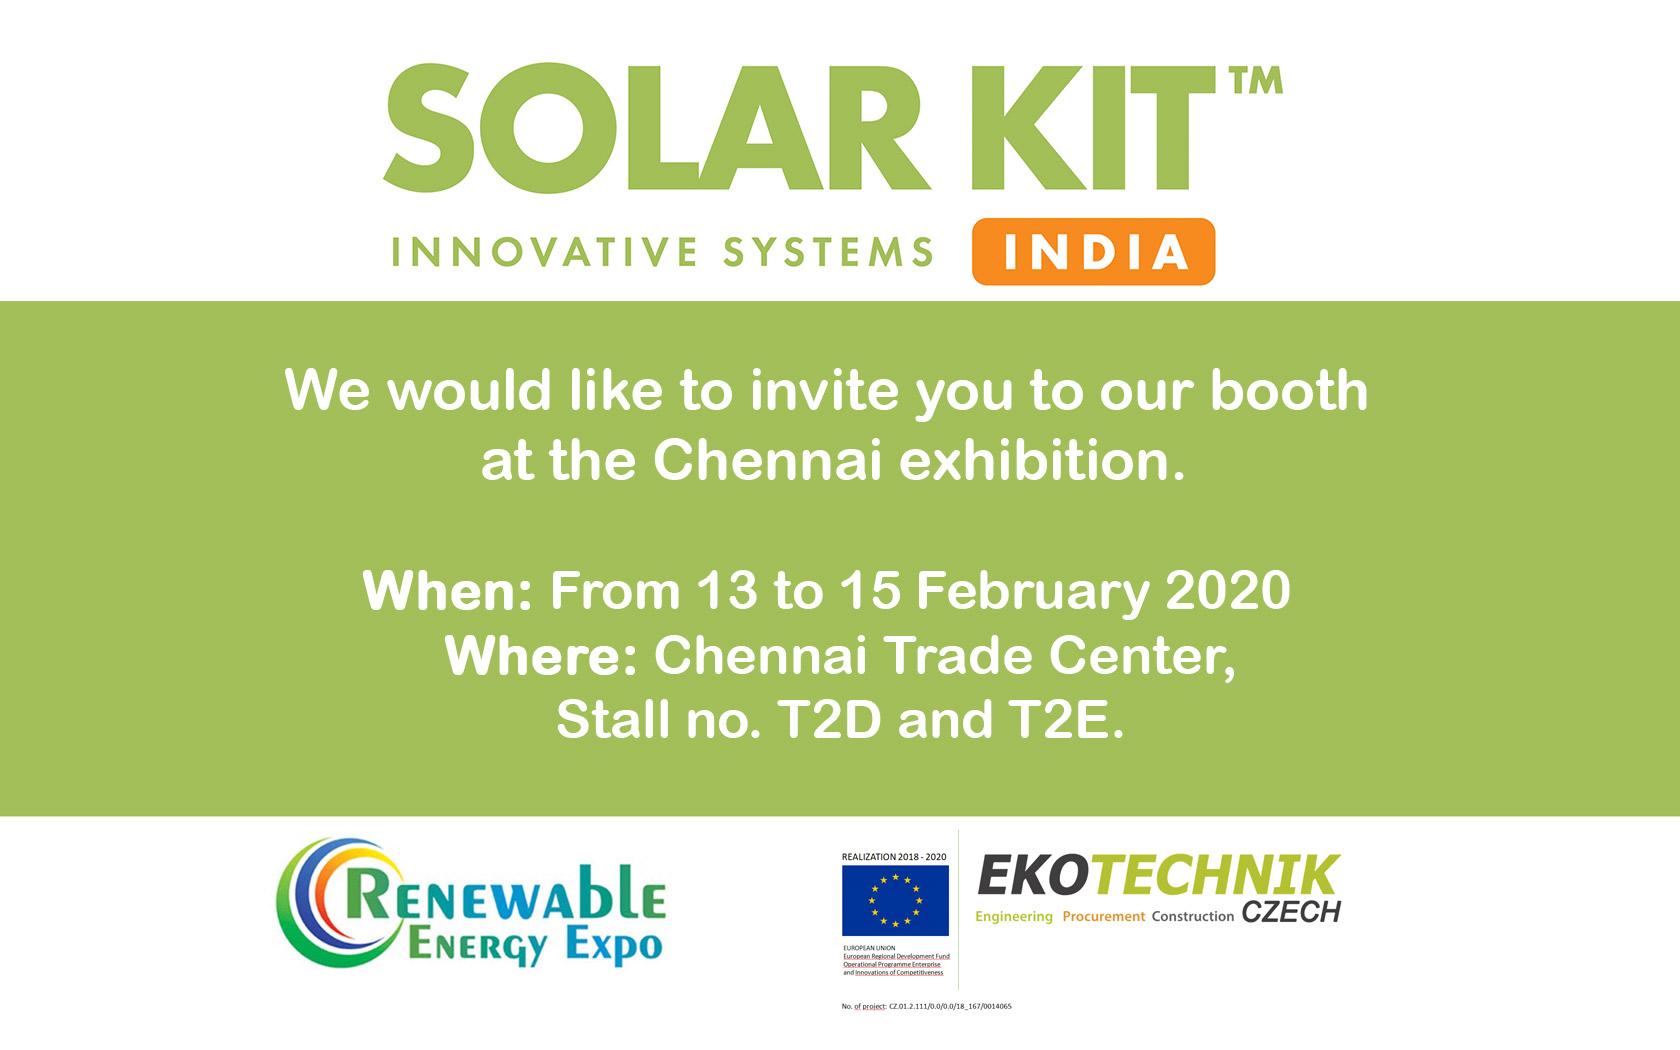 Invitation to exhibition Renewable Energy Expo 13 - 15 Feb 2020 - Chennai